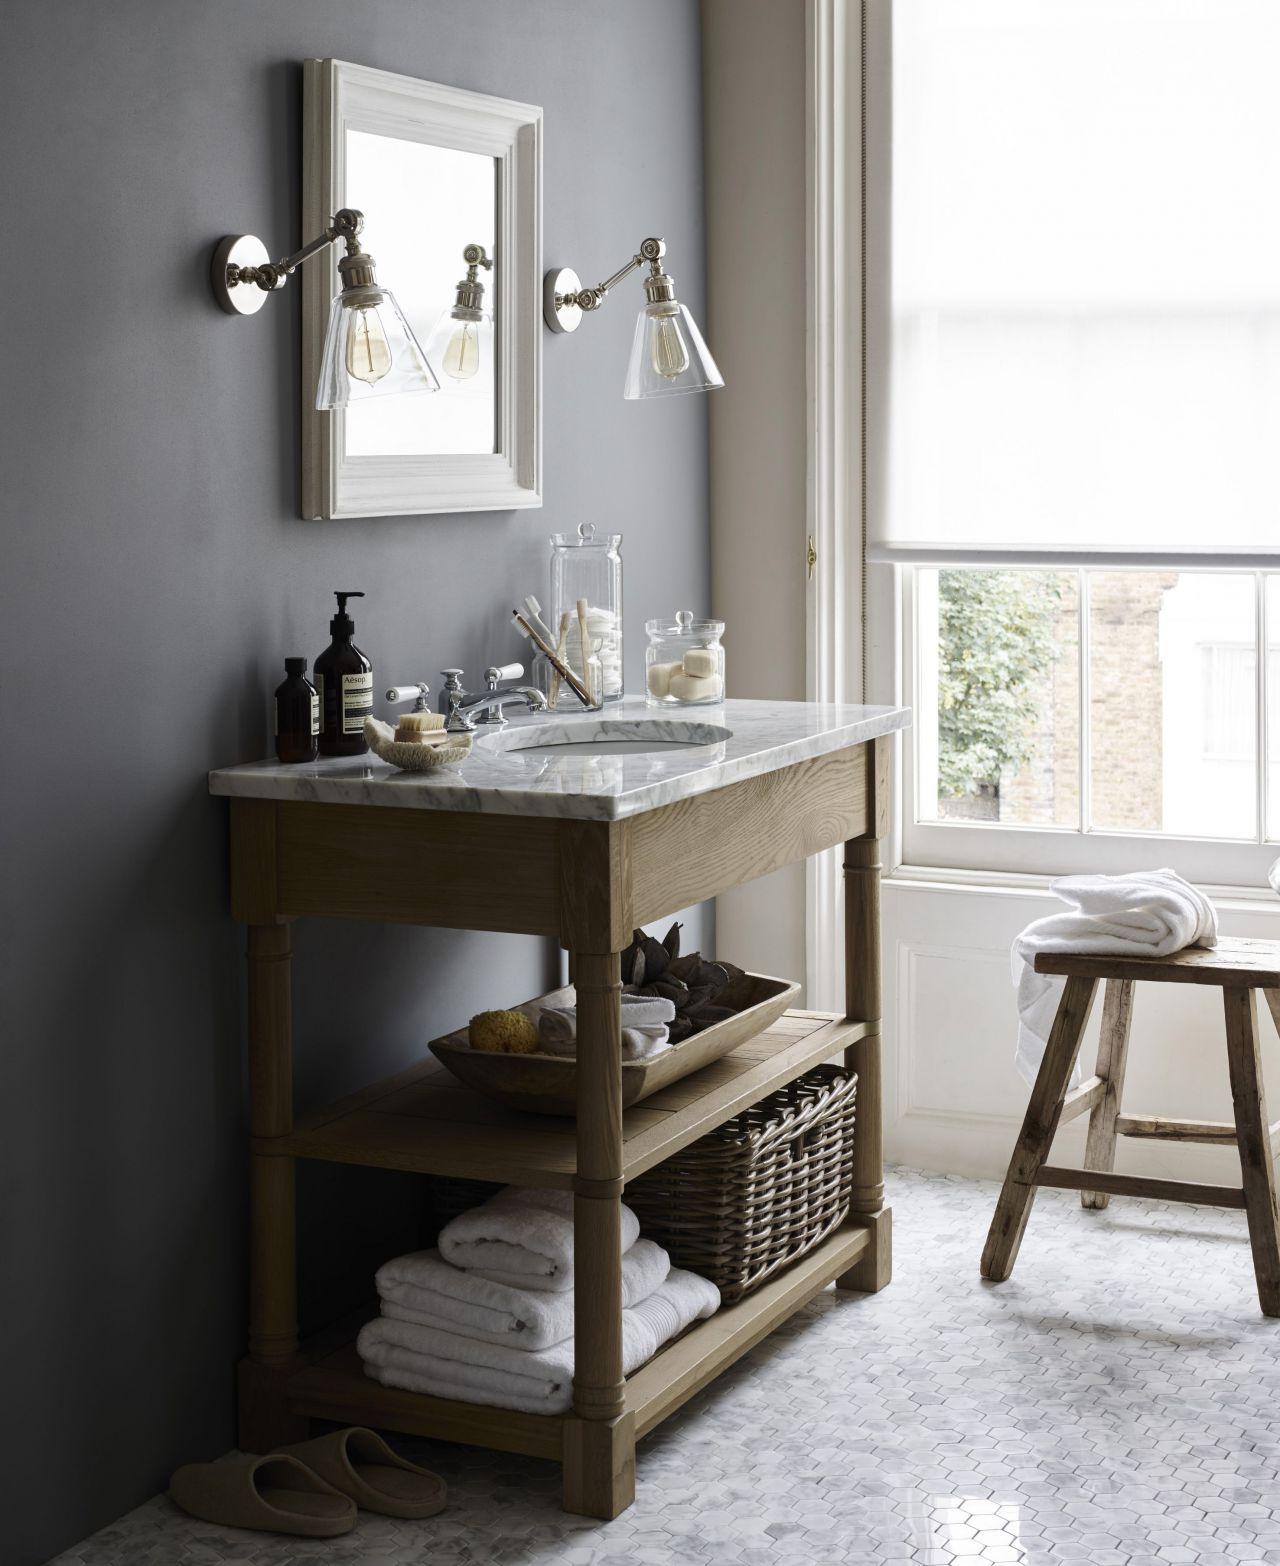 Bathroom Storage Ideas: 23 Clever Ways To Stay Tidy